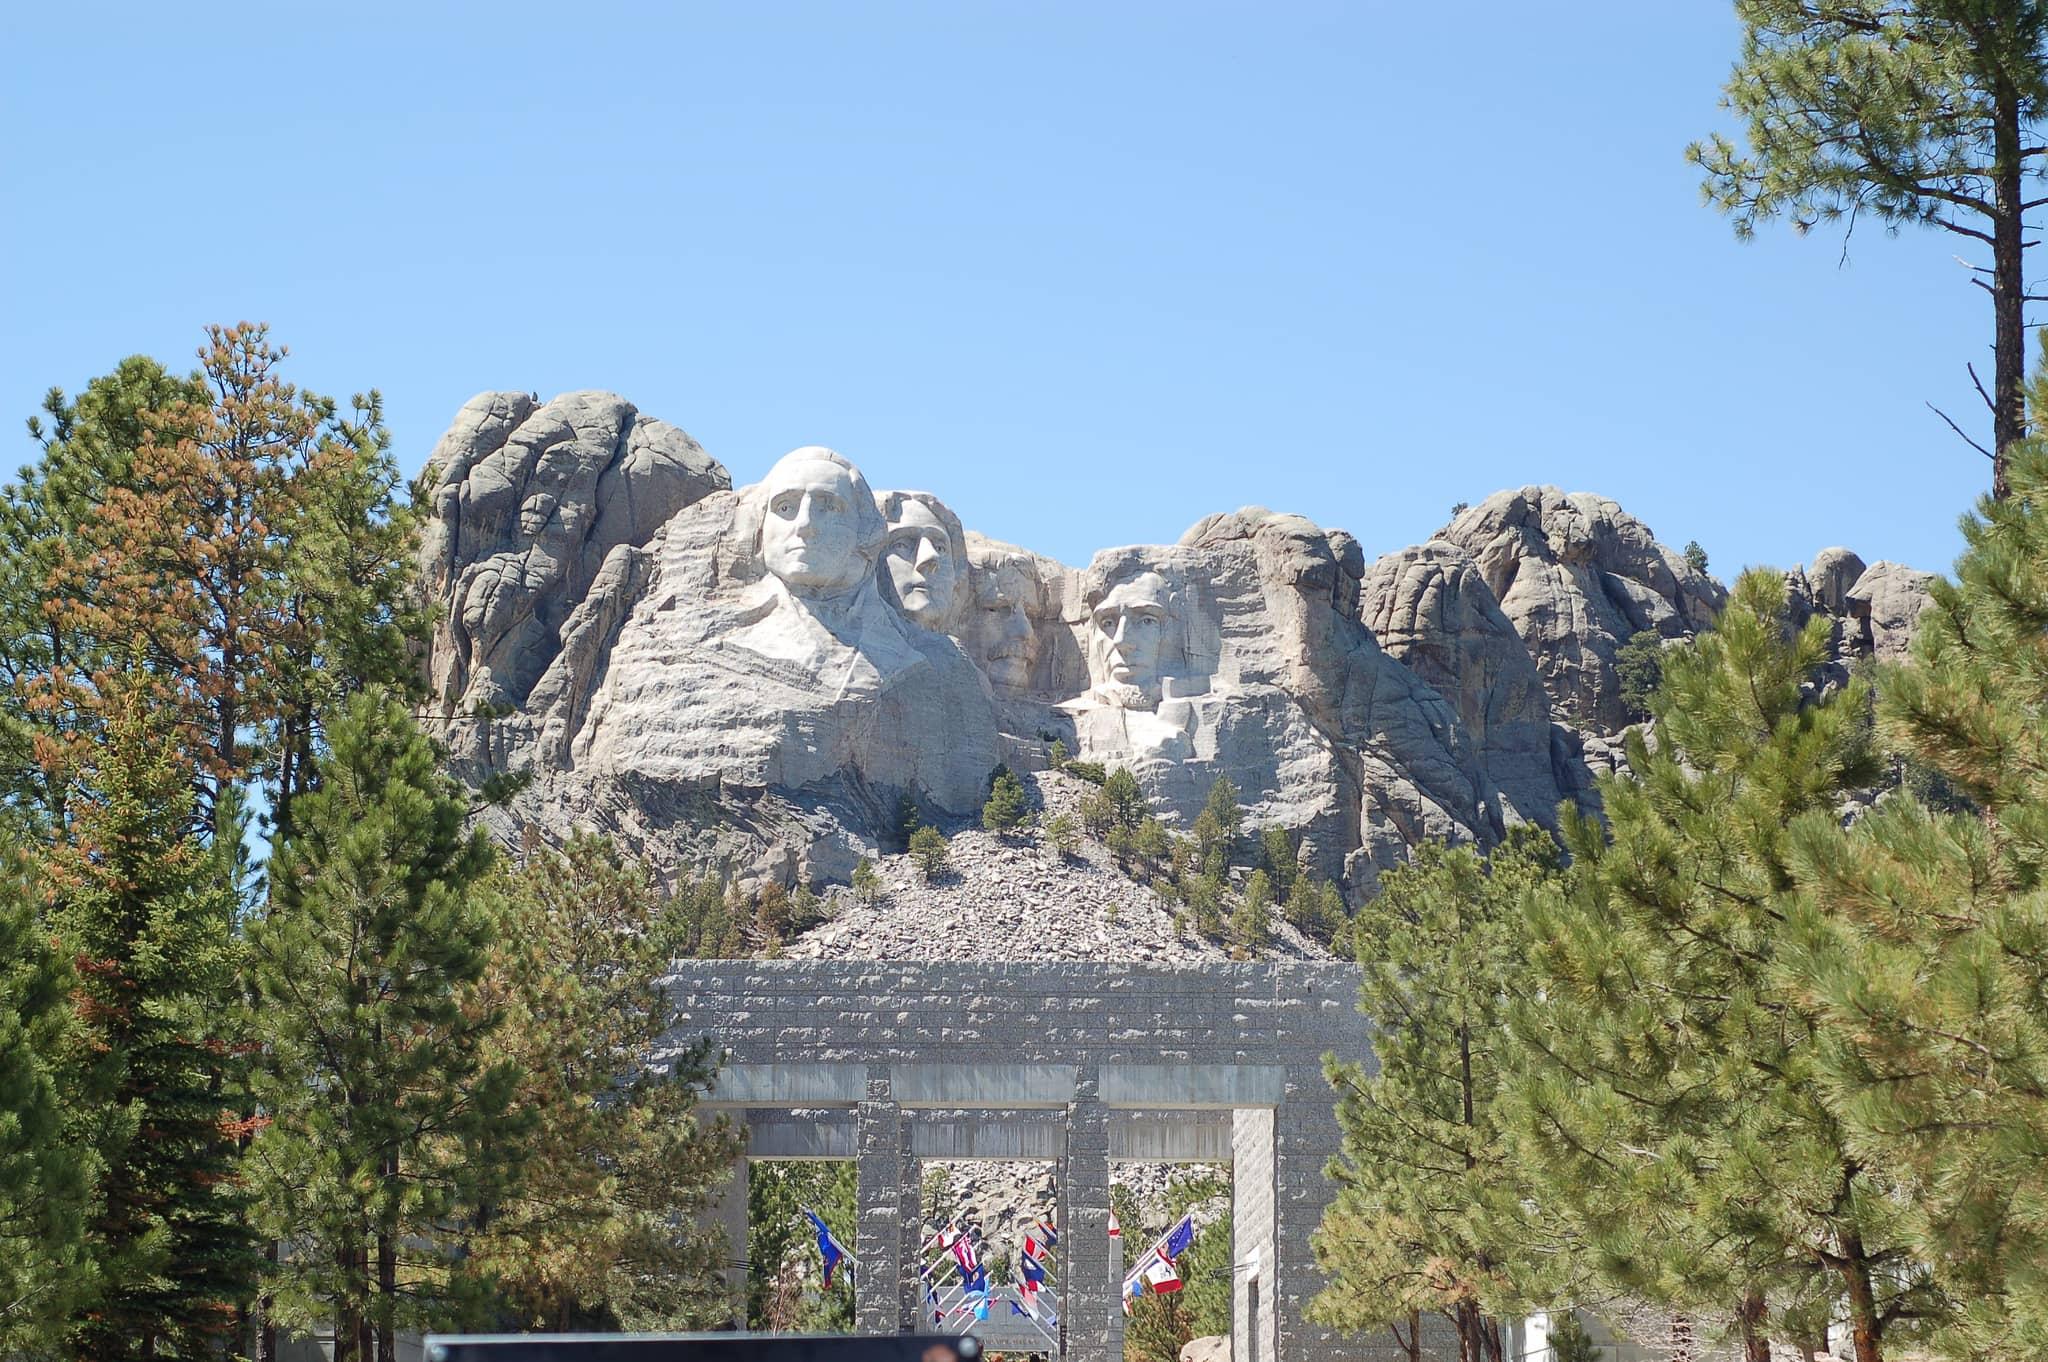 Mount Rushmore isn't pet-friendly